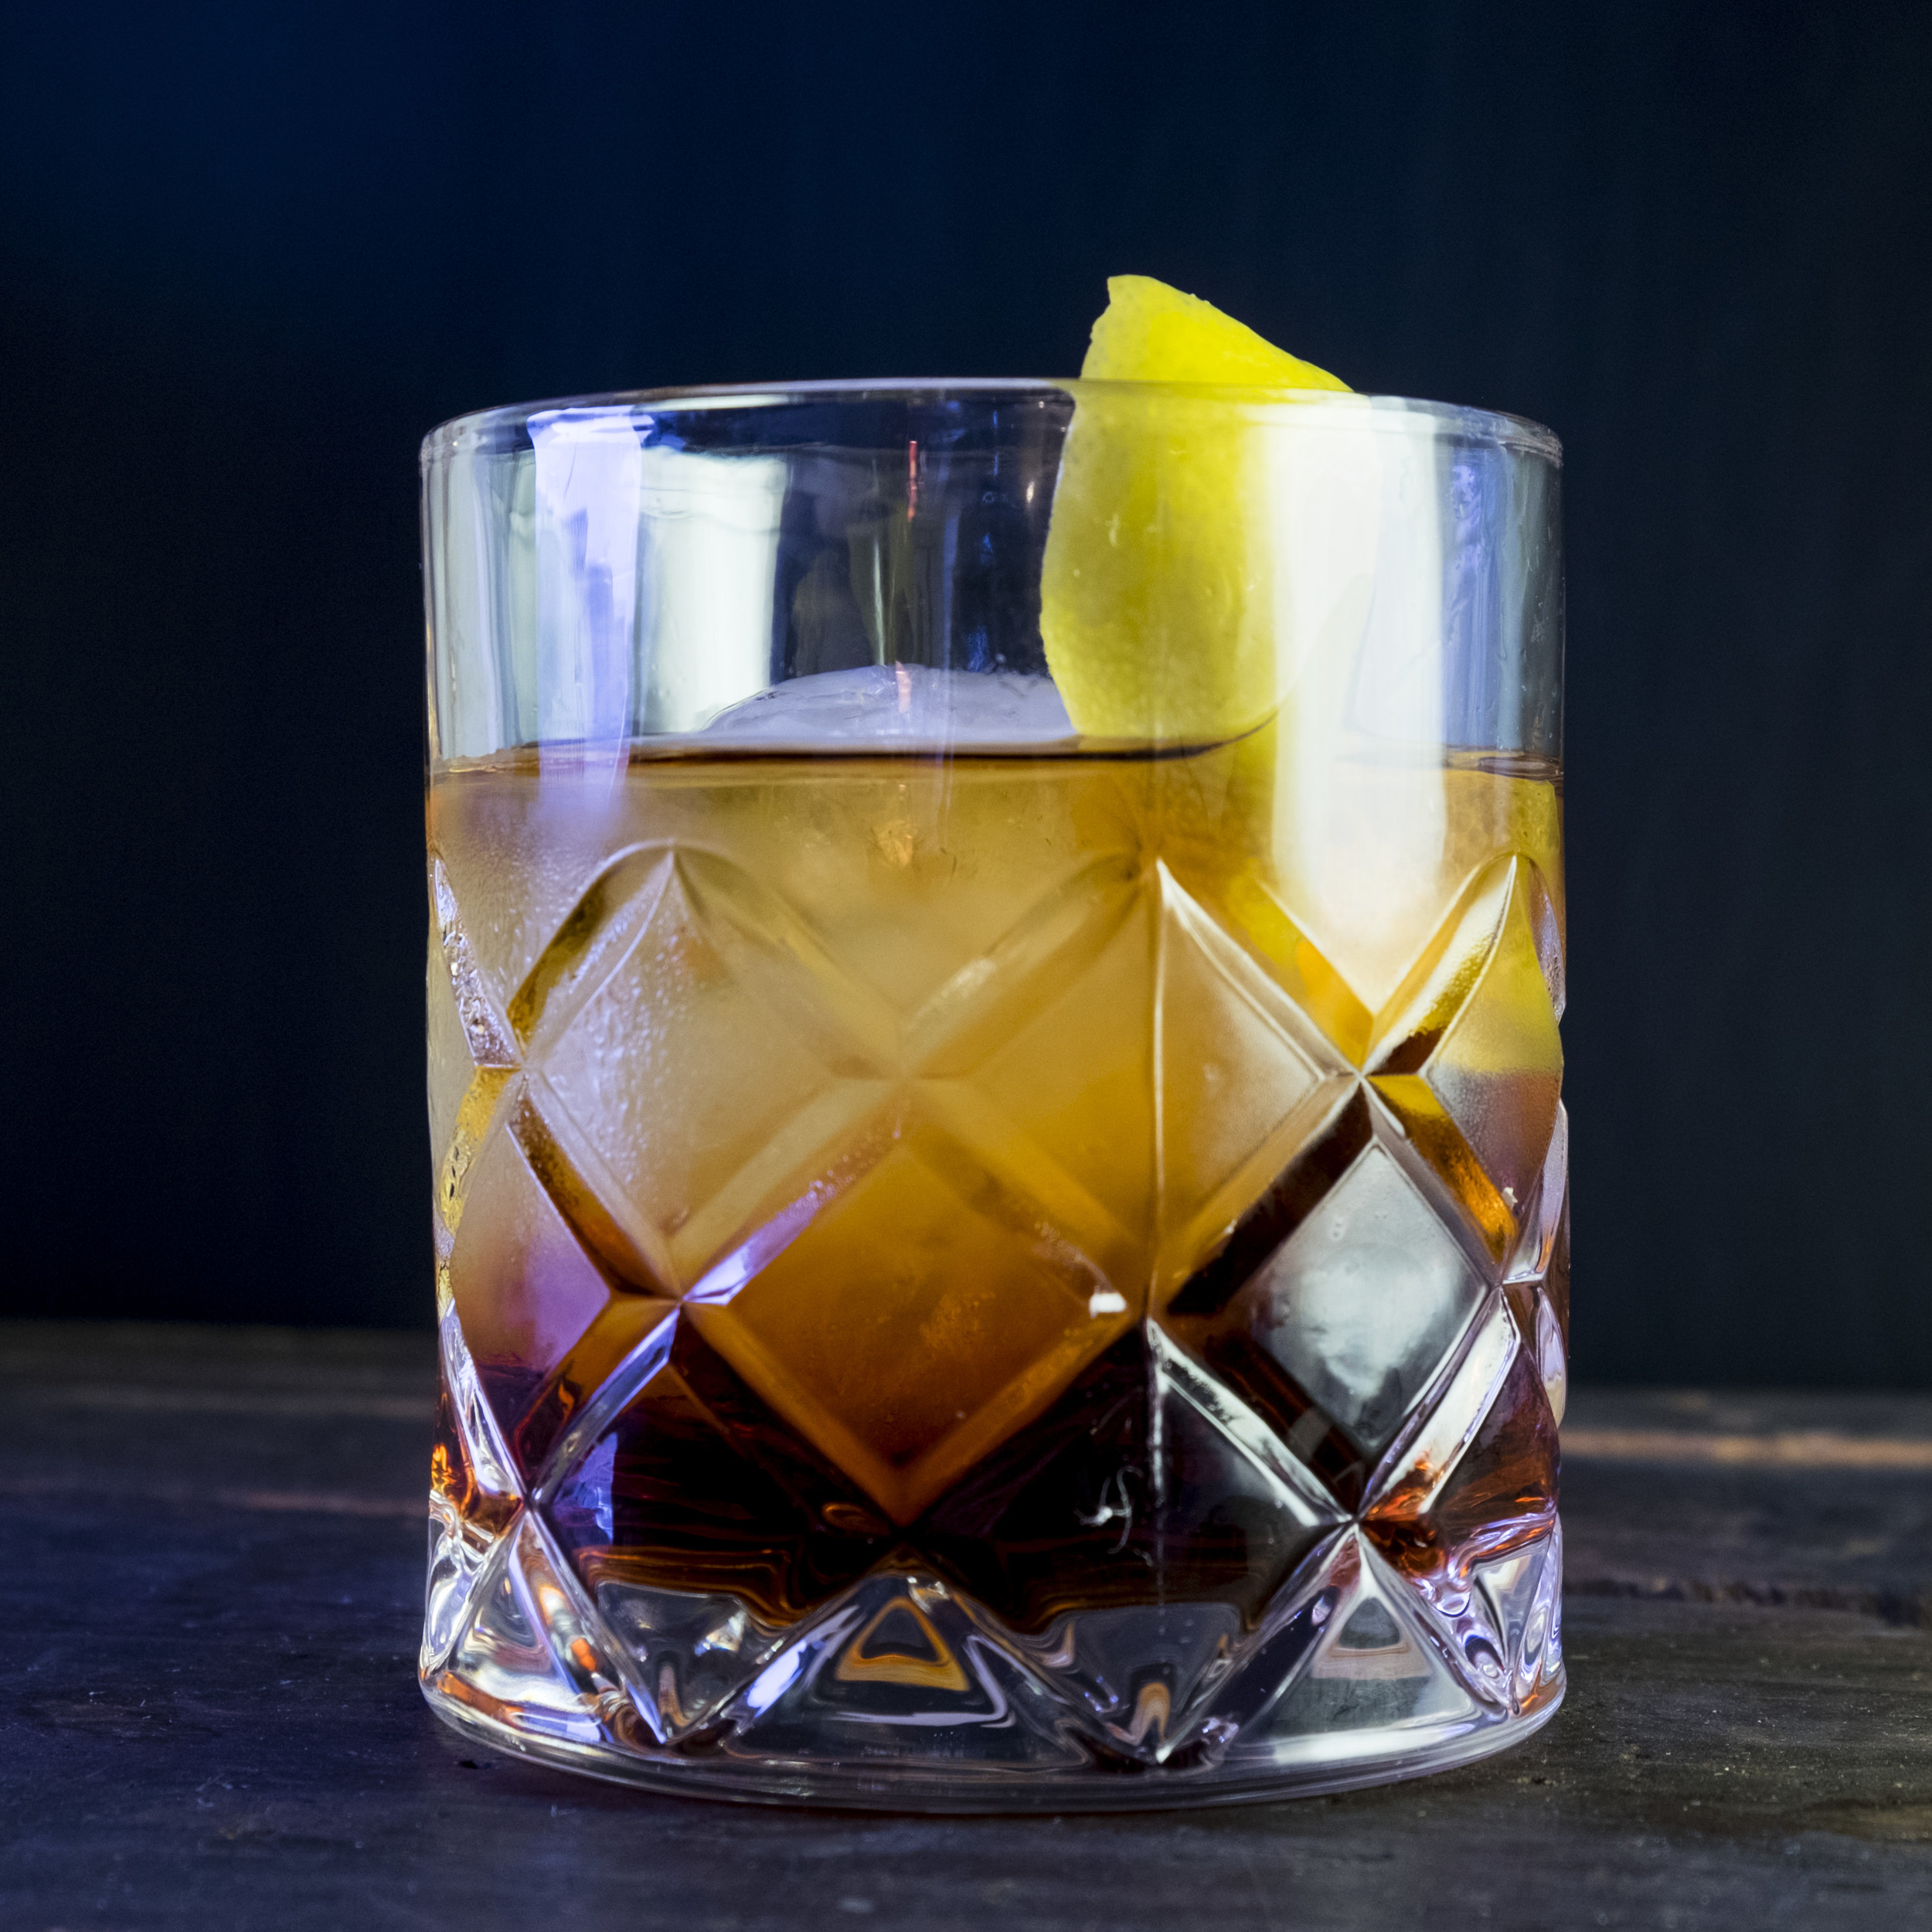 Groundhog Day Cocktail